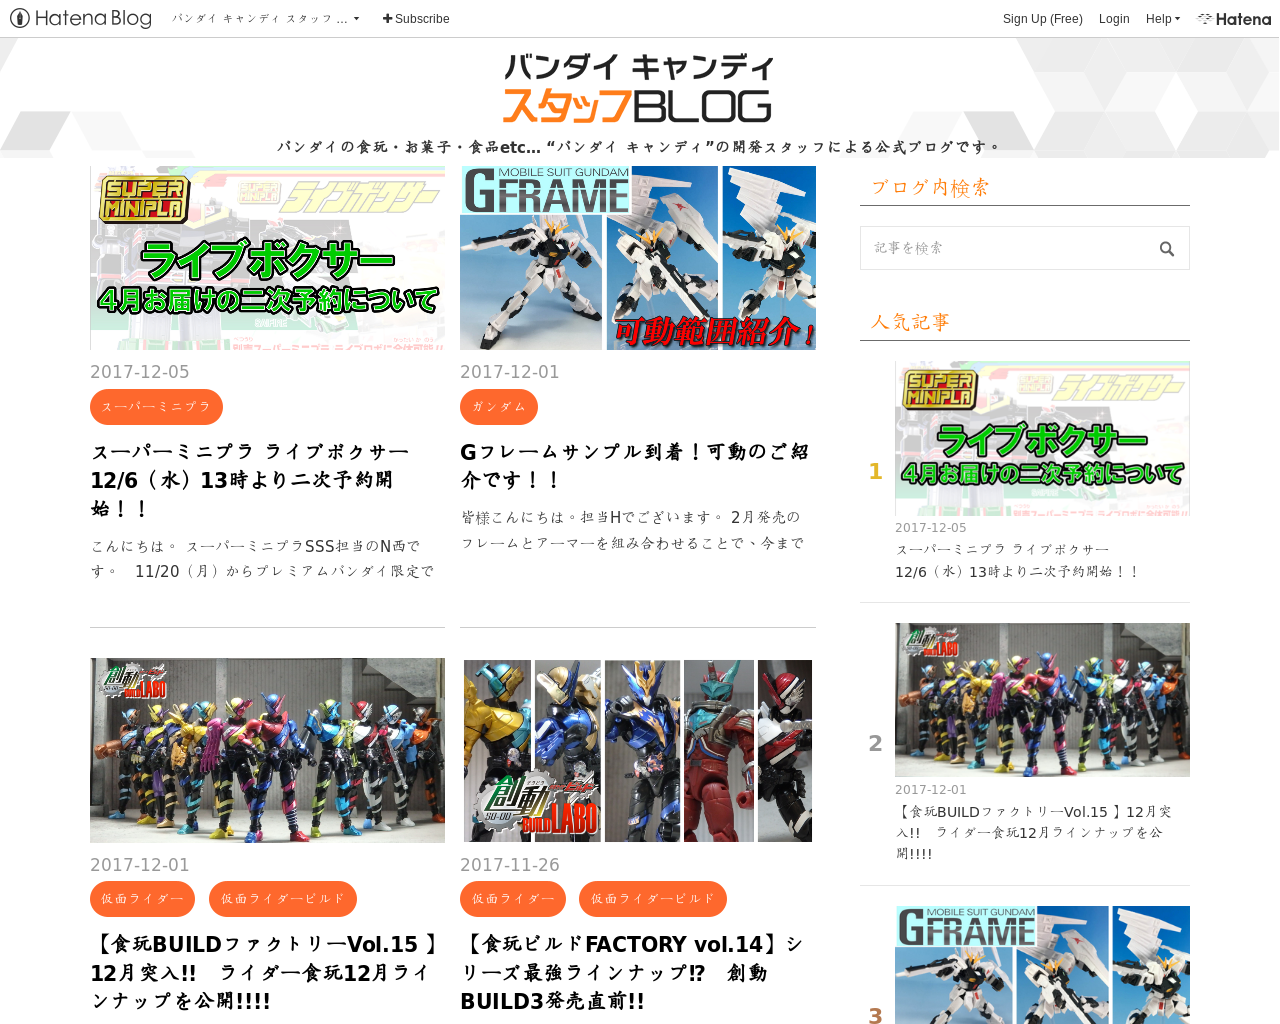 bandaicandy.hateblo.jp(2017/12/03 09:10:21)